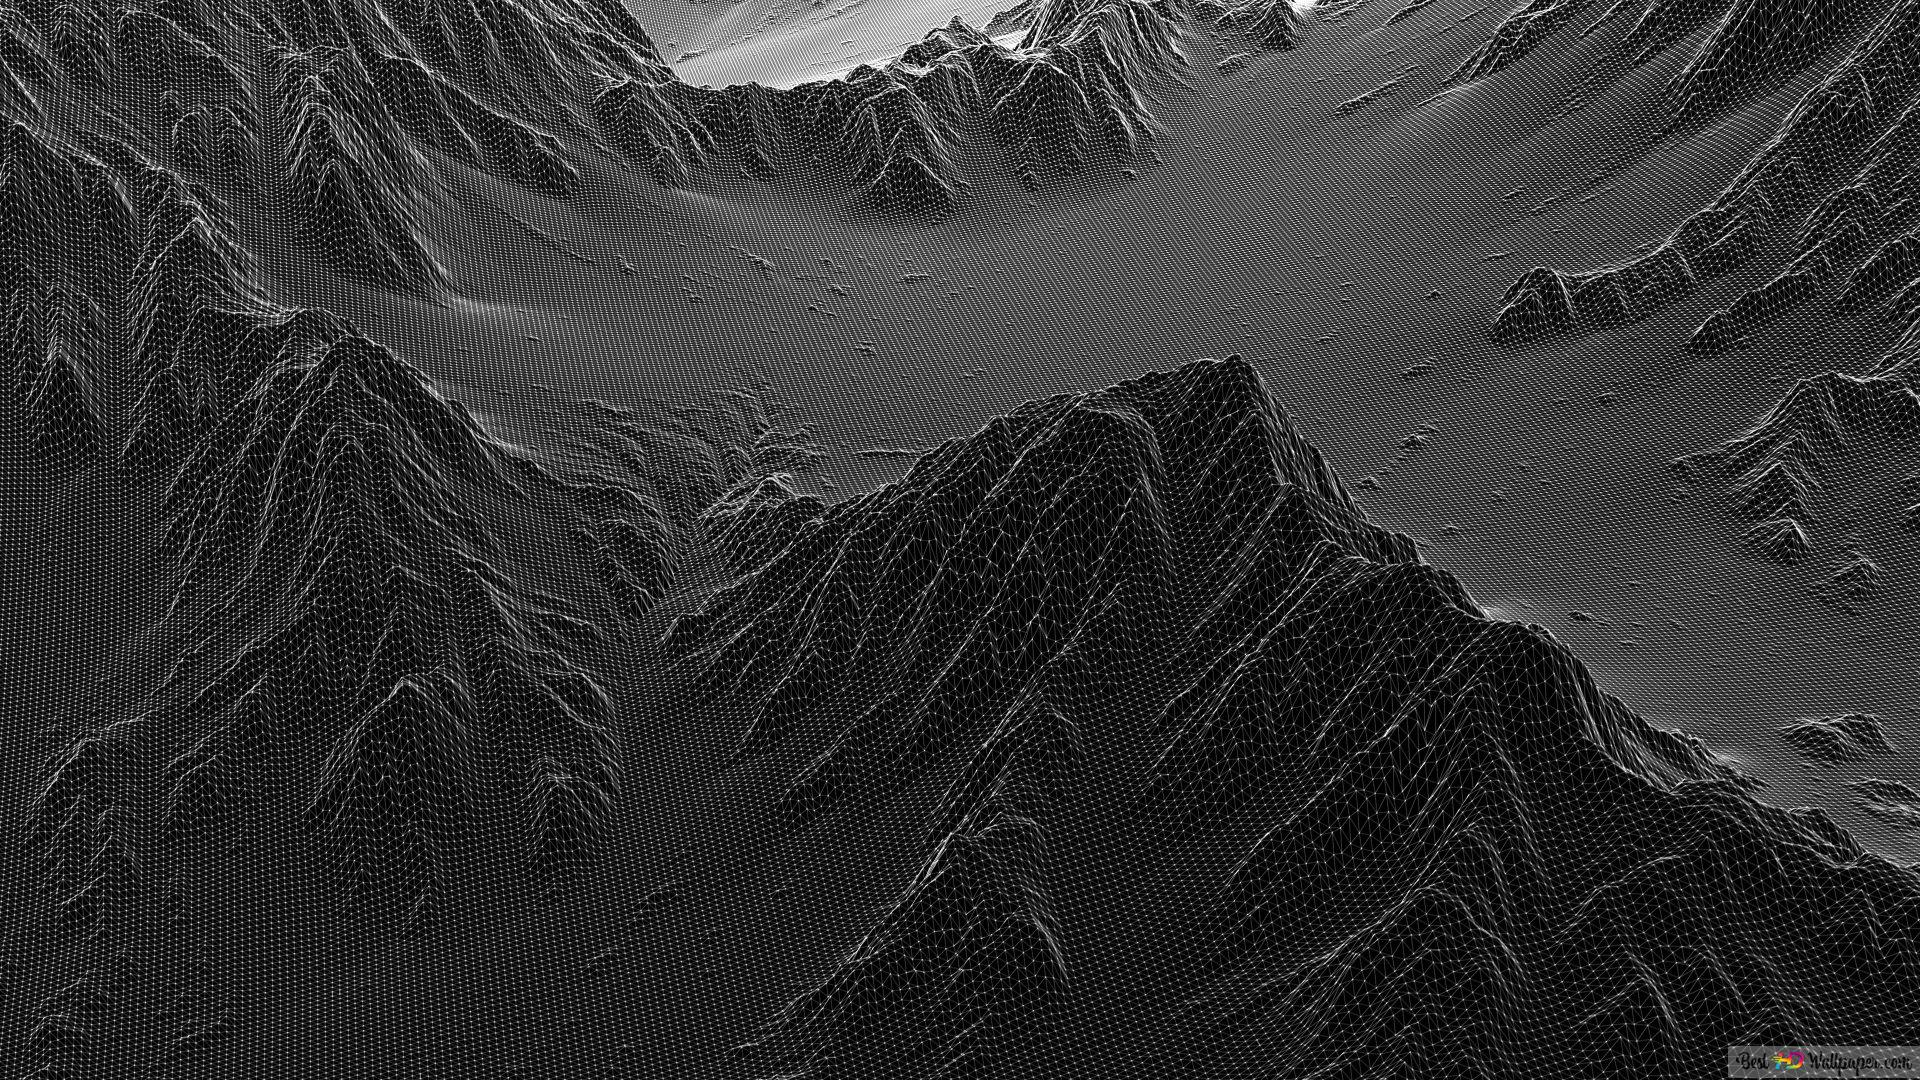 Artistic Black Mountain Hd Wallpaper Download